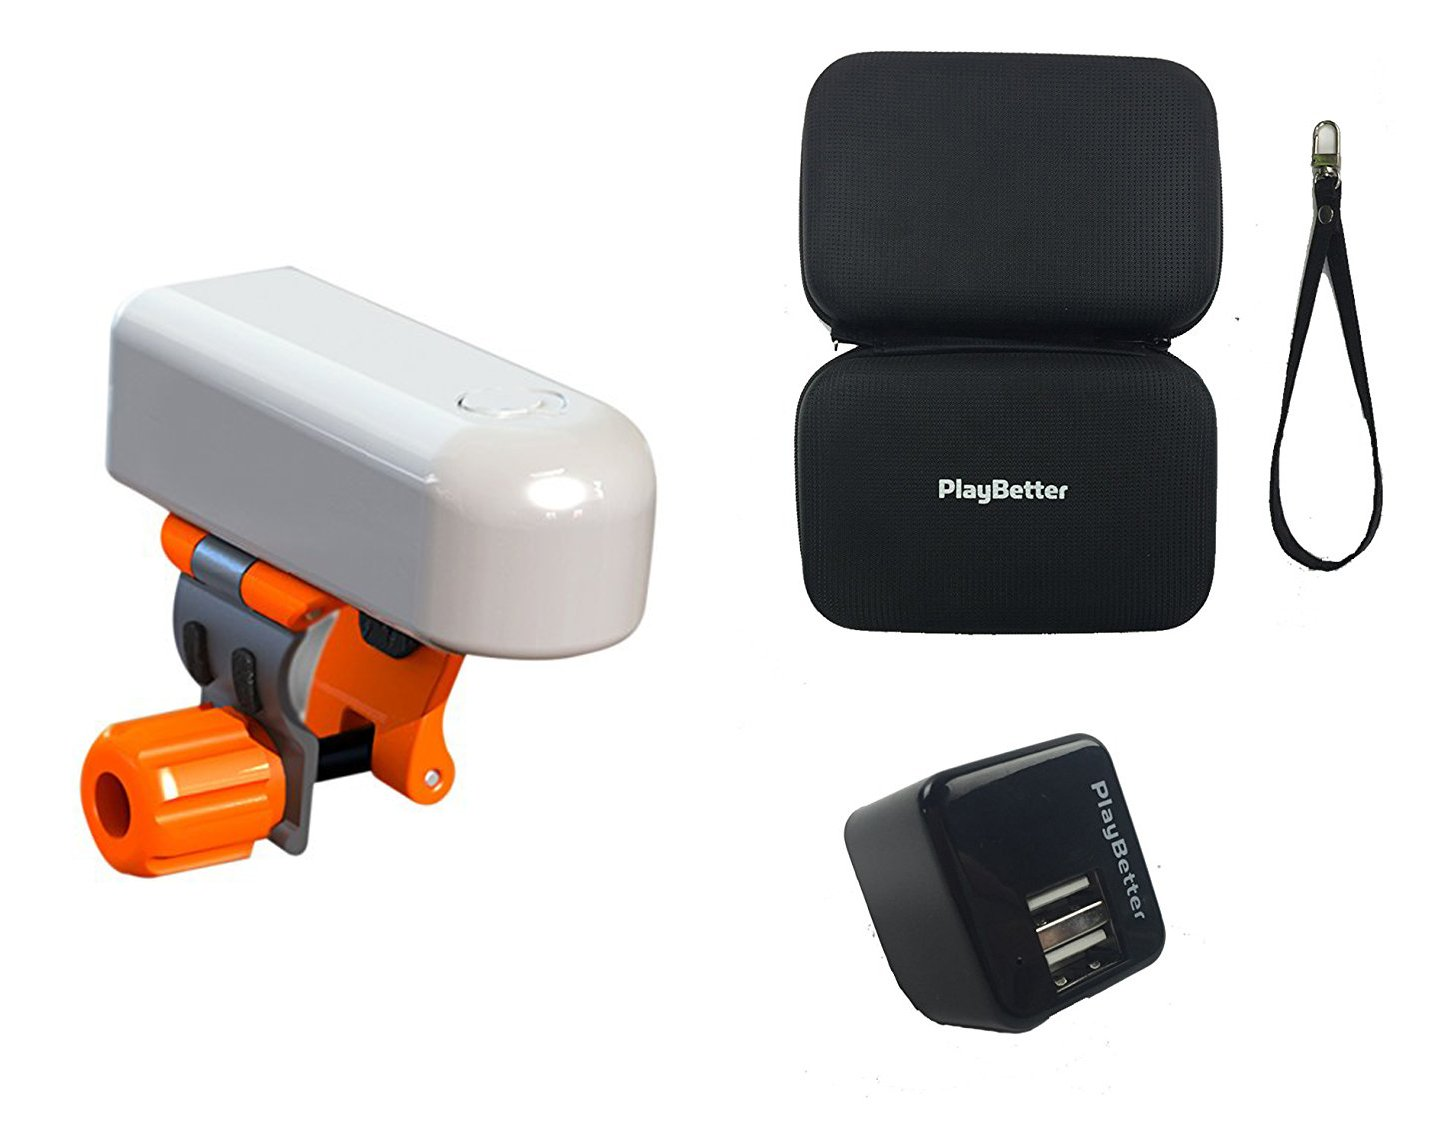 SkyCaddie SkyPro Golf Swing Analyzer BUNDLE with PlayBetter Hard Carry Case & USB Wall Adapter   Instant 3D Swing Analysis